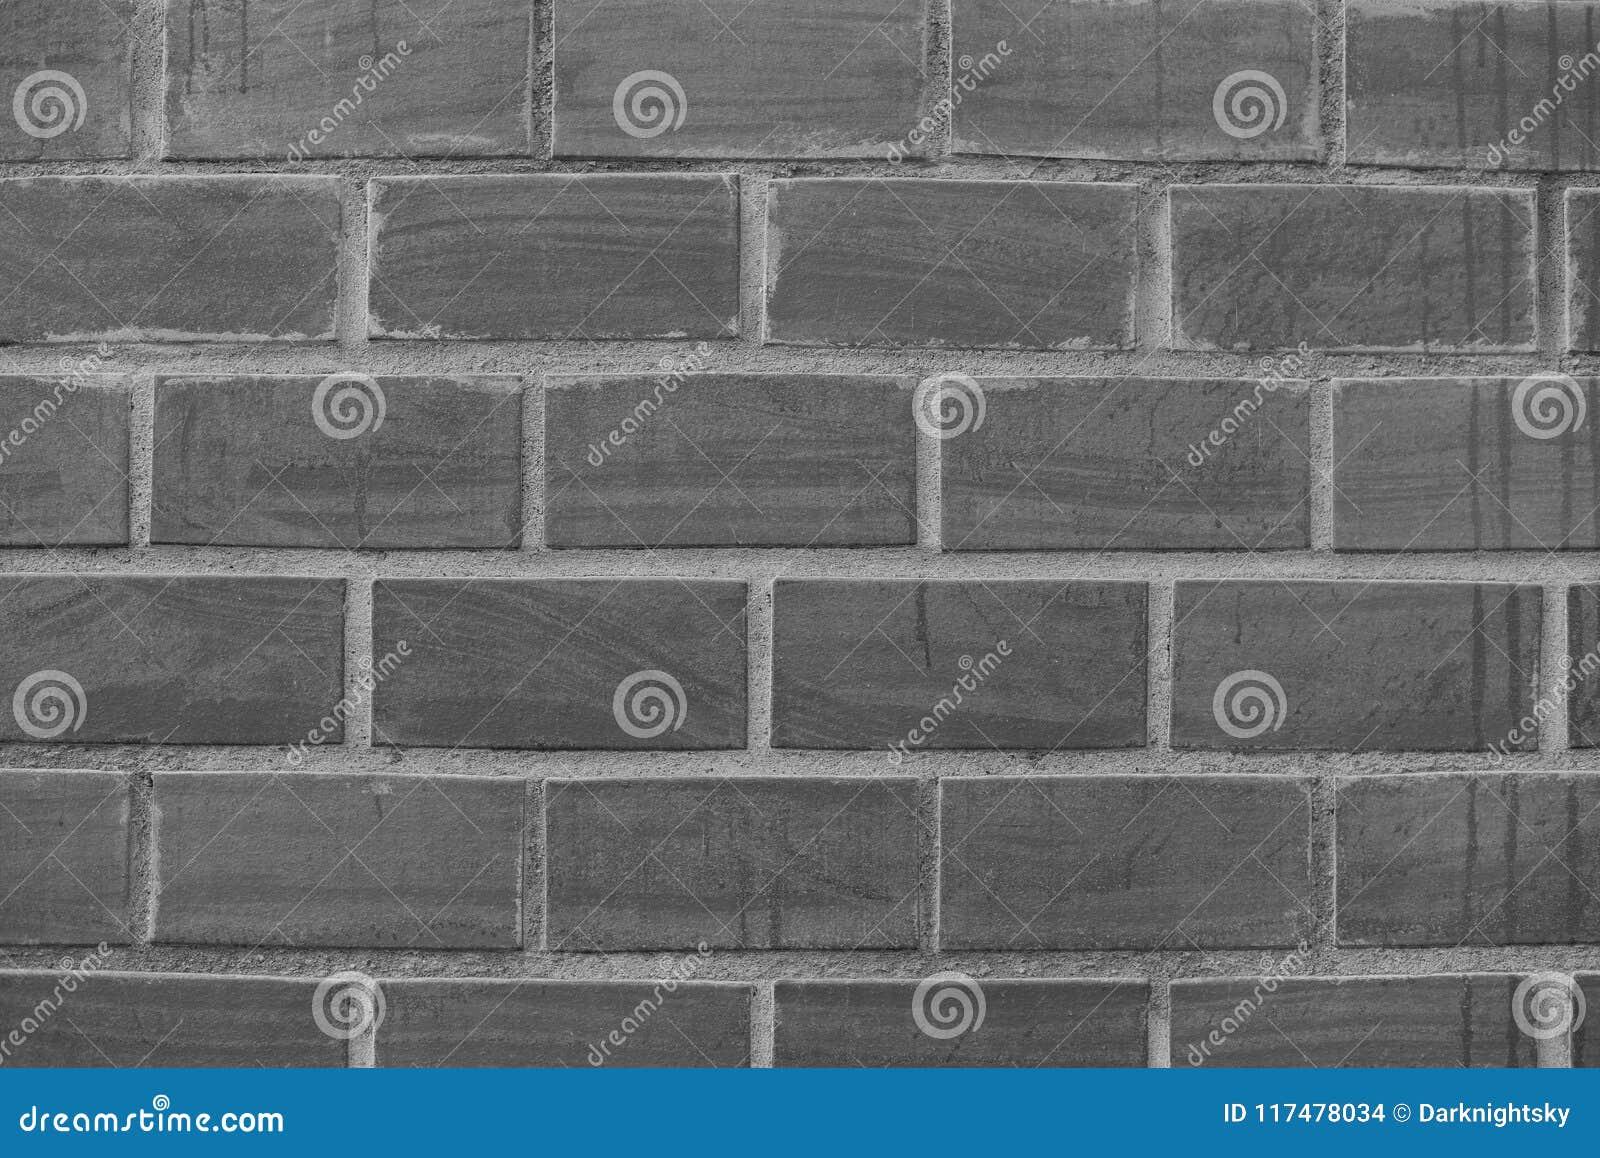 Generic Brick Architecture Industrial Elevation Stock Photo Image